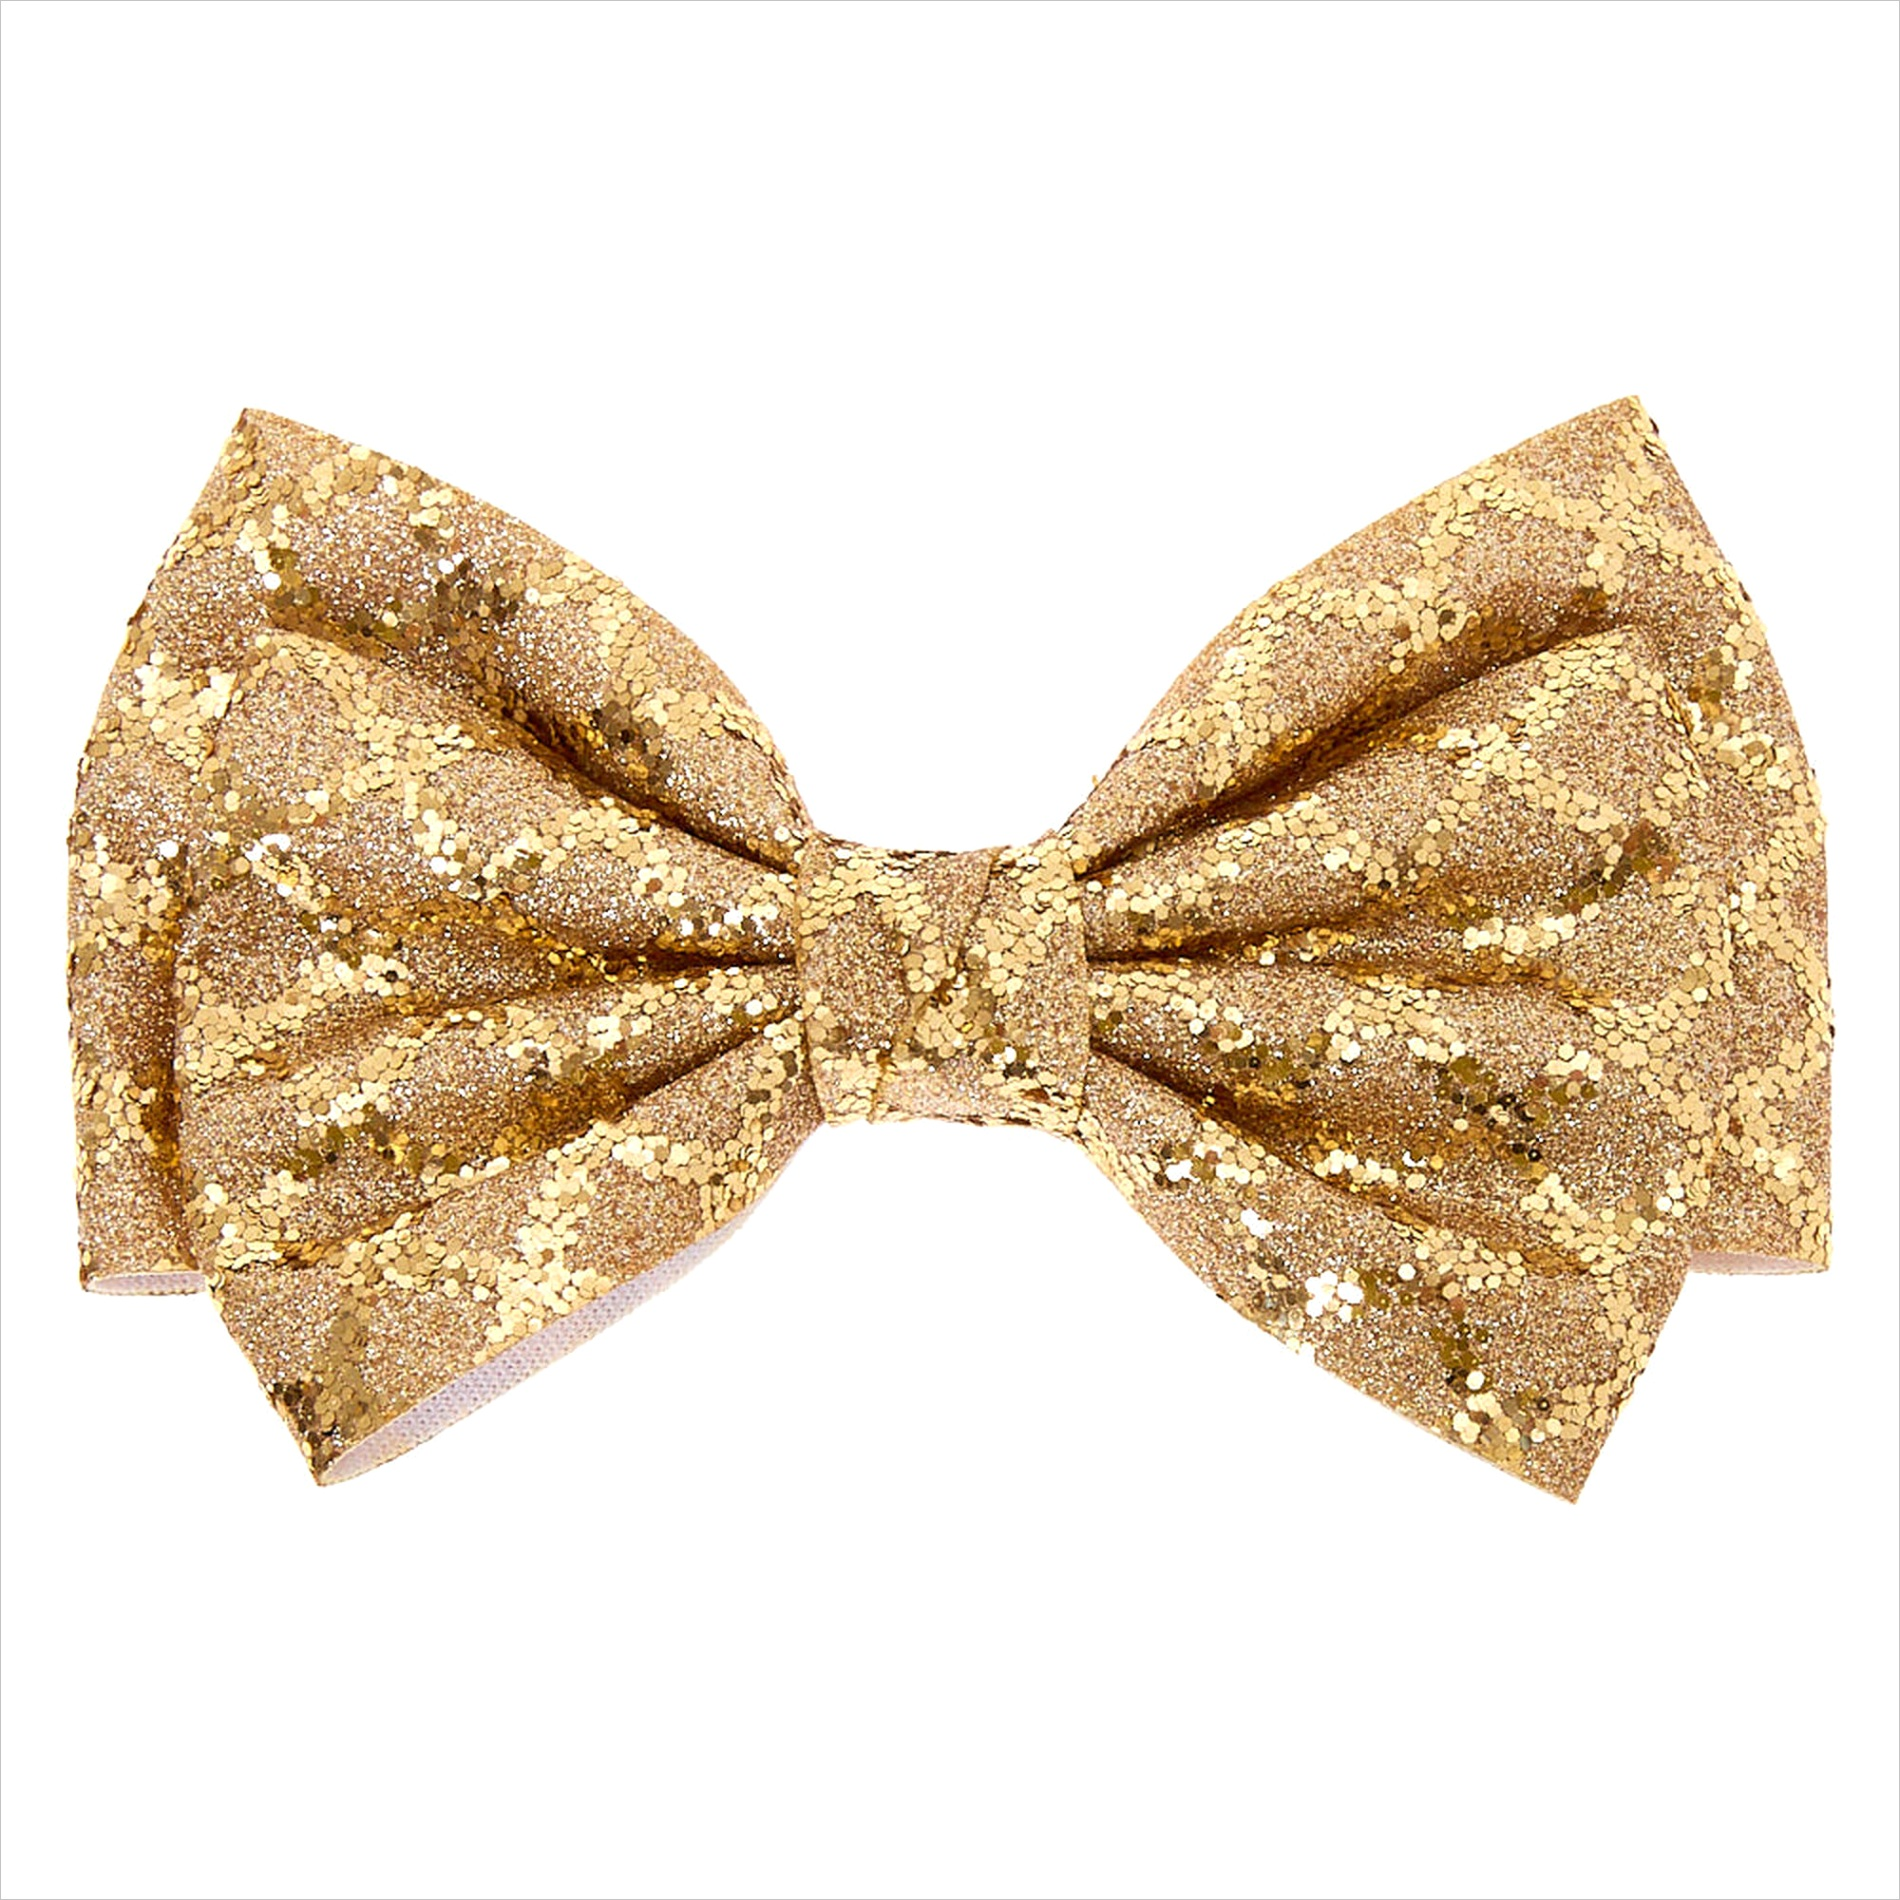 christmas glitter hair bow clip gold cgid=1&lang=en